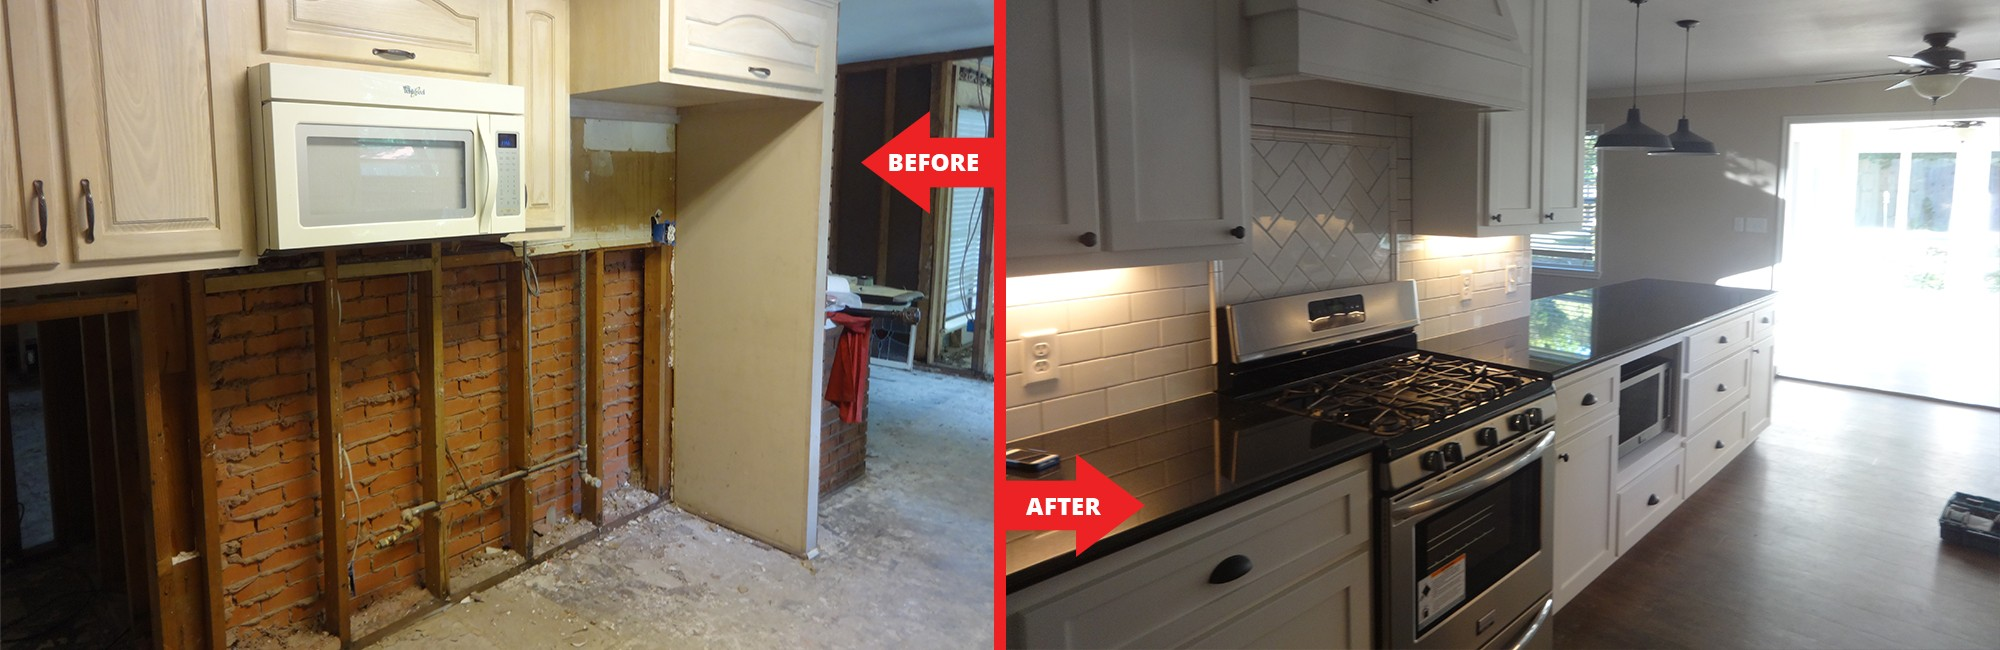 East Texas Remodeling Contractor Kitchen Bath Longview TX Omni - Bathroom remodel longview tx